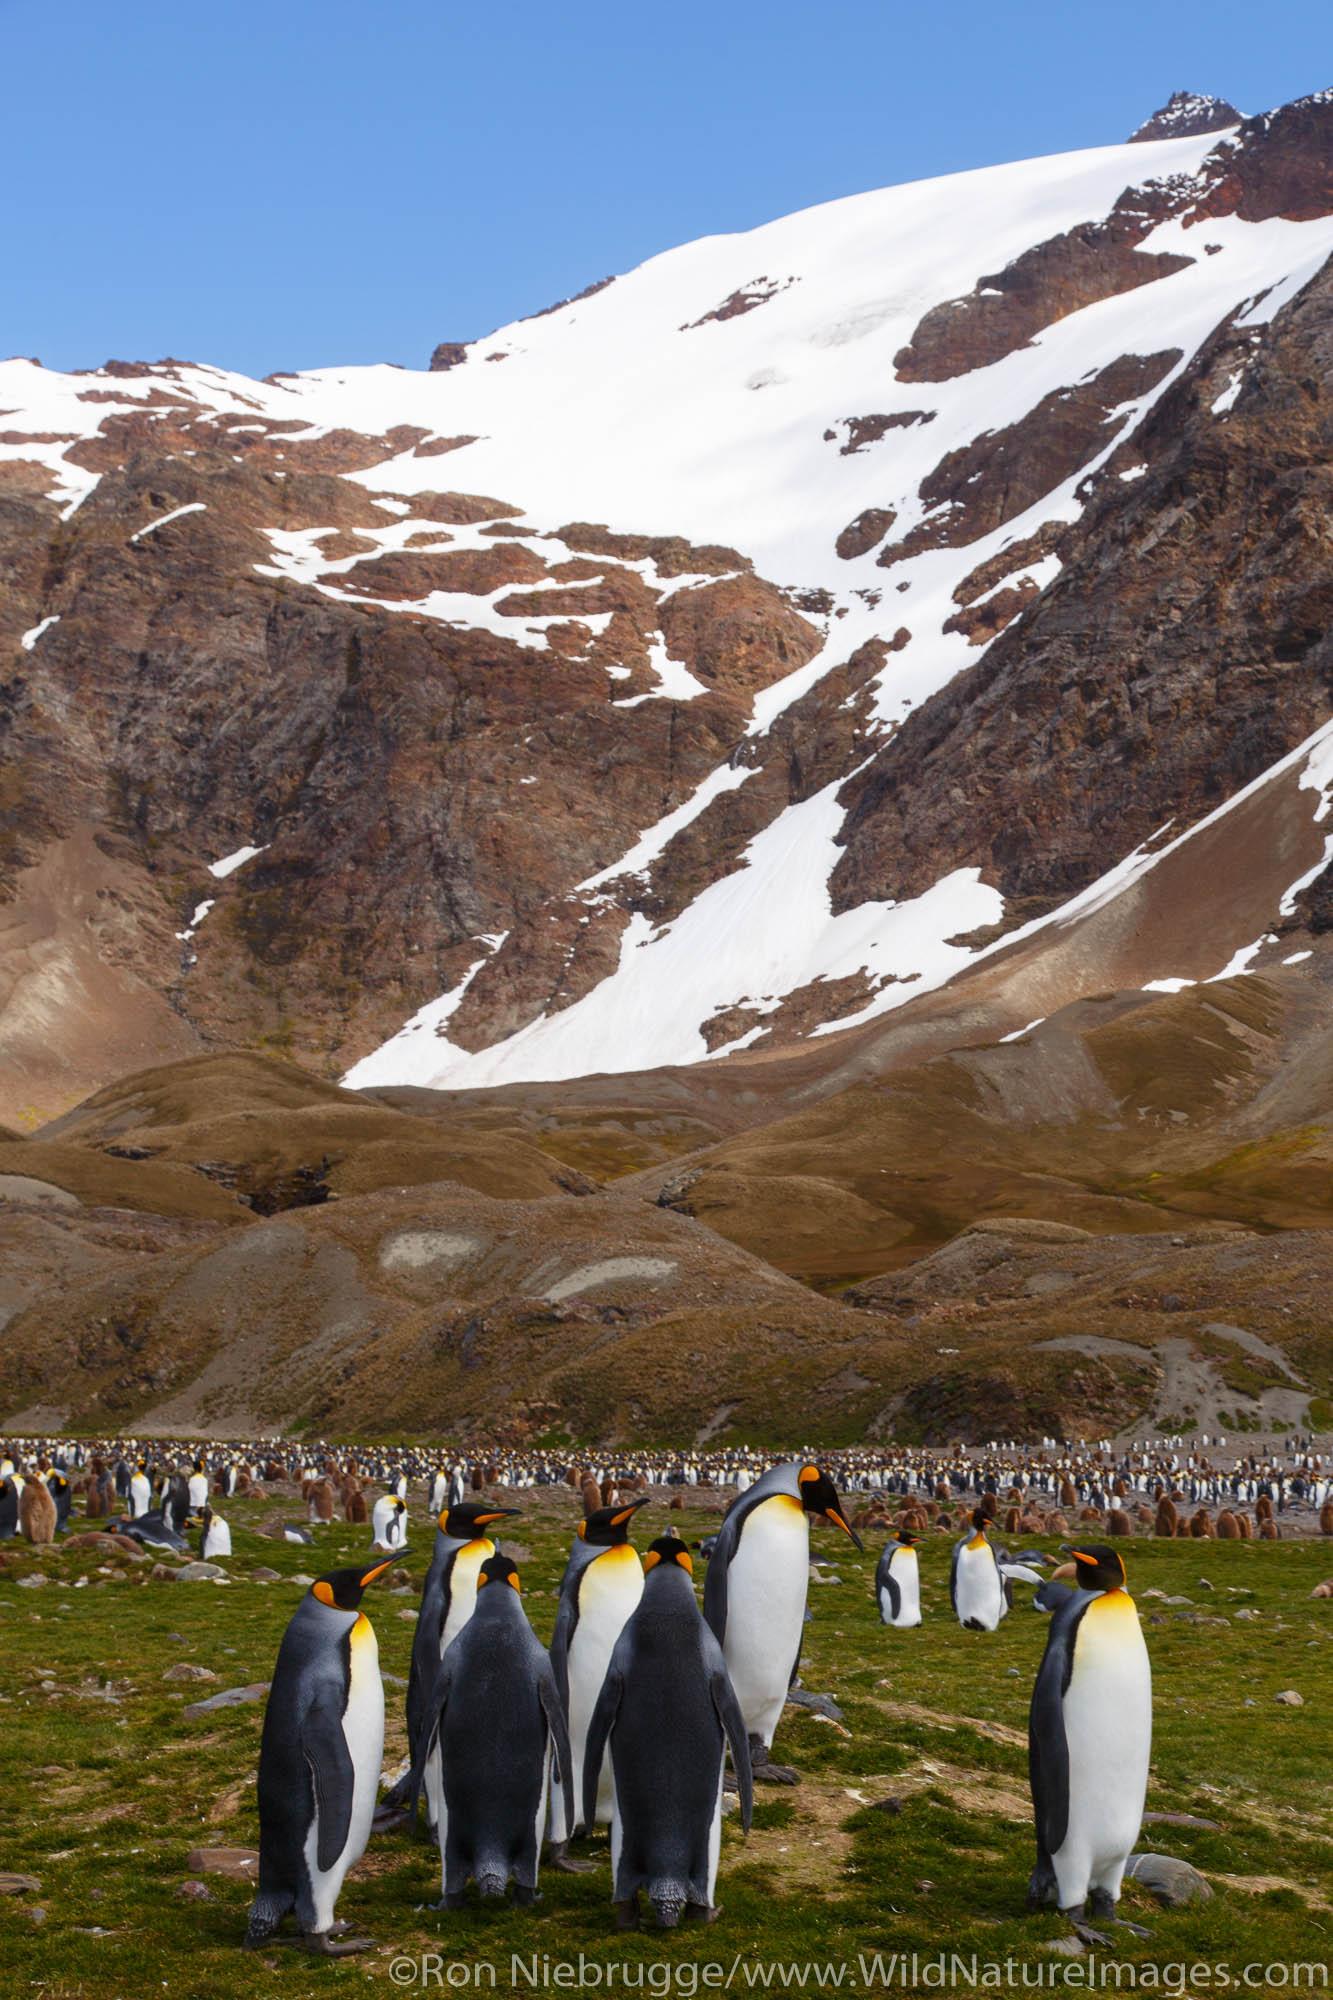 King penguins (Aptenodytes patagonicus), Fortuna Bay, South Georgia Island, Antarctica.